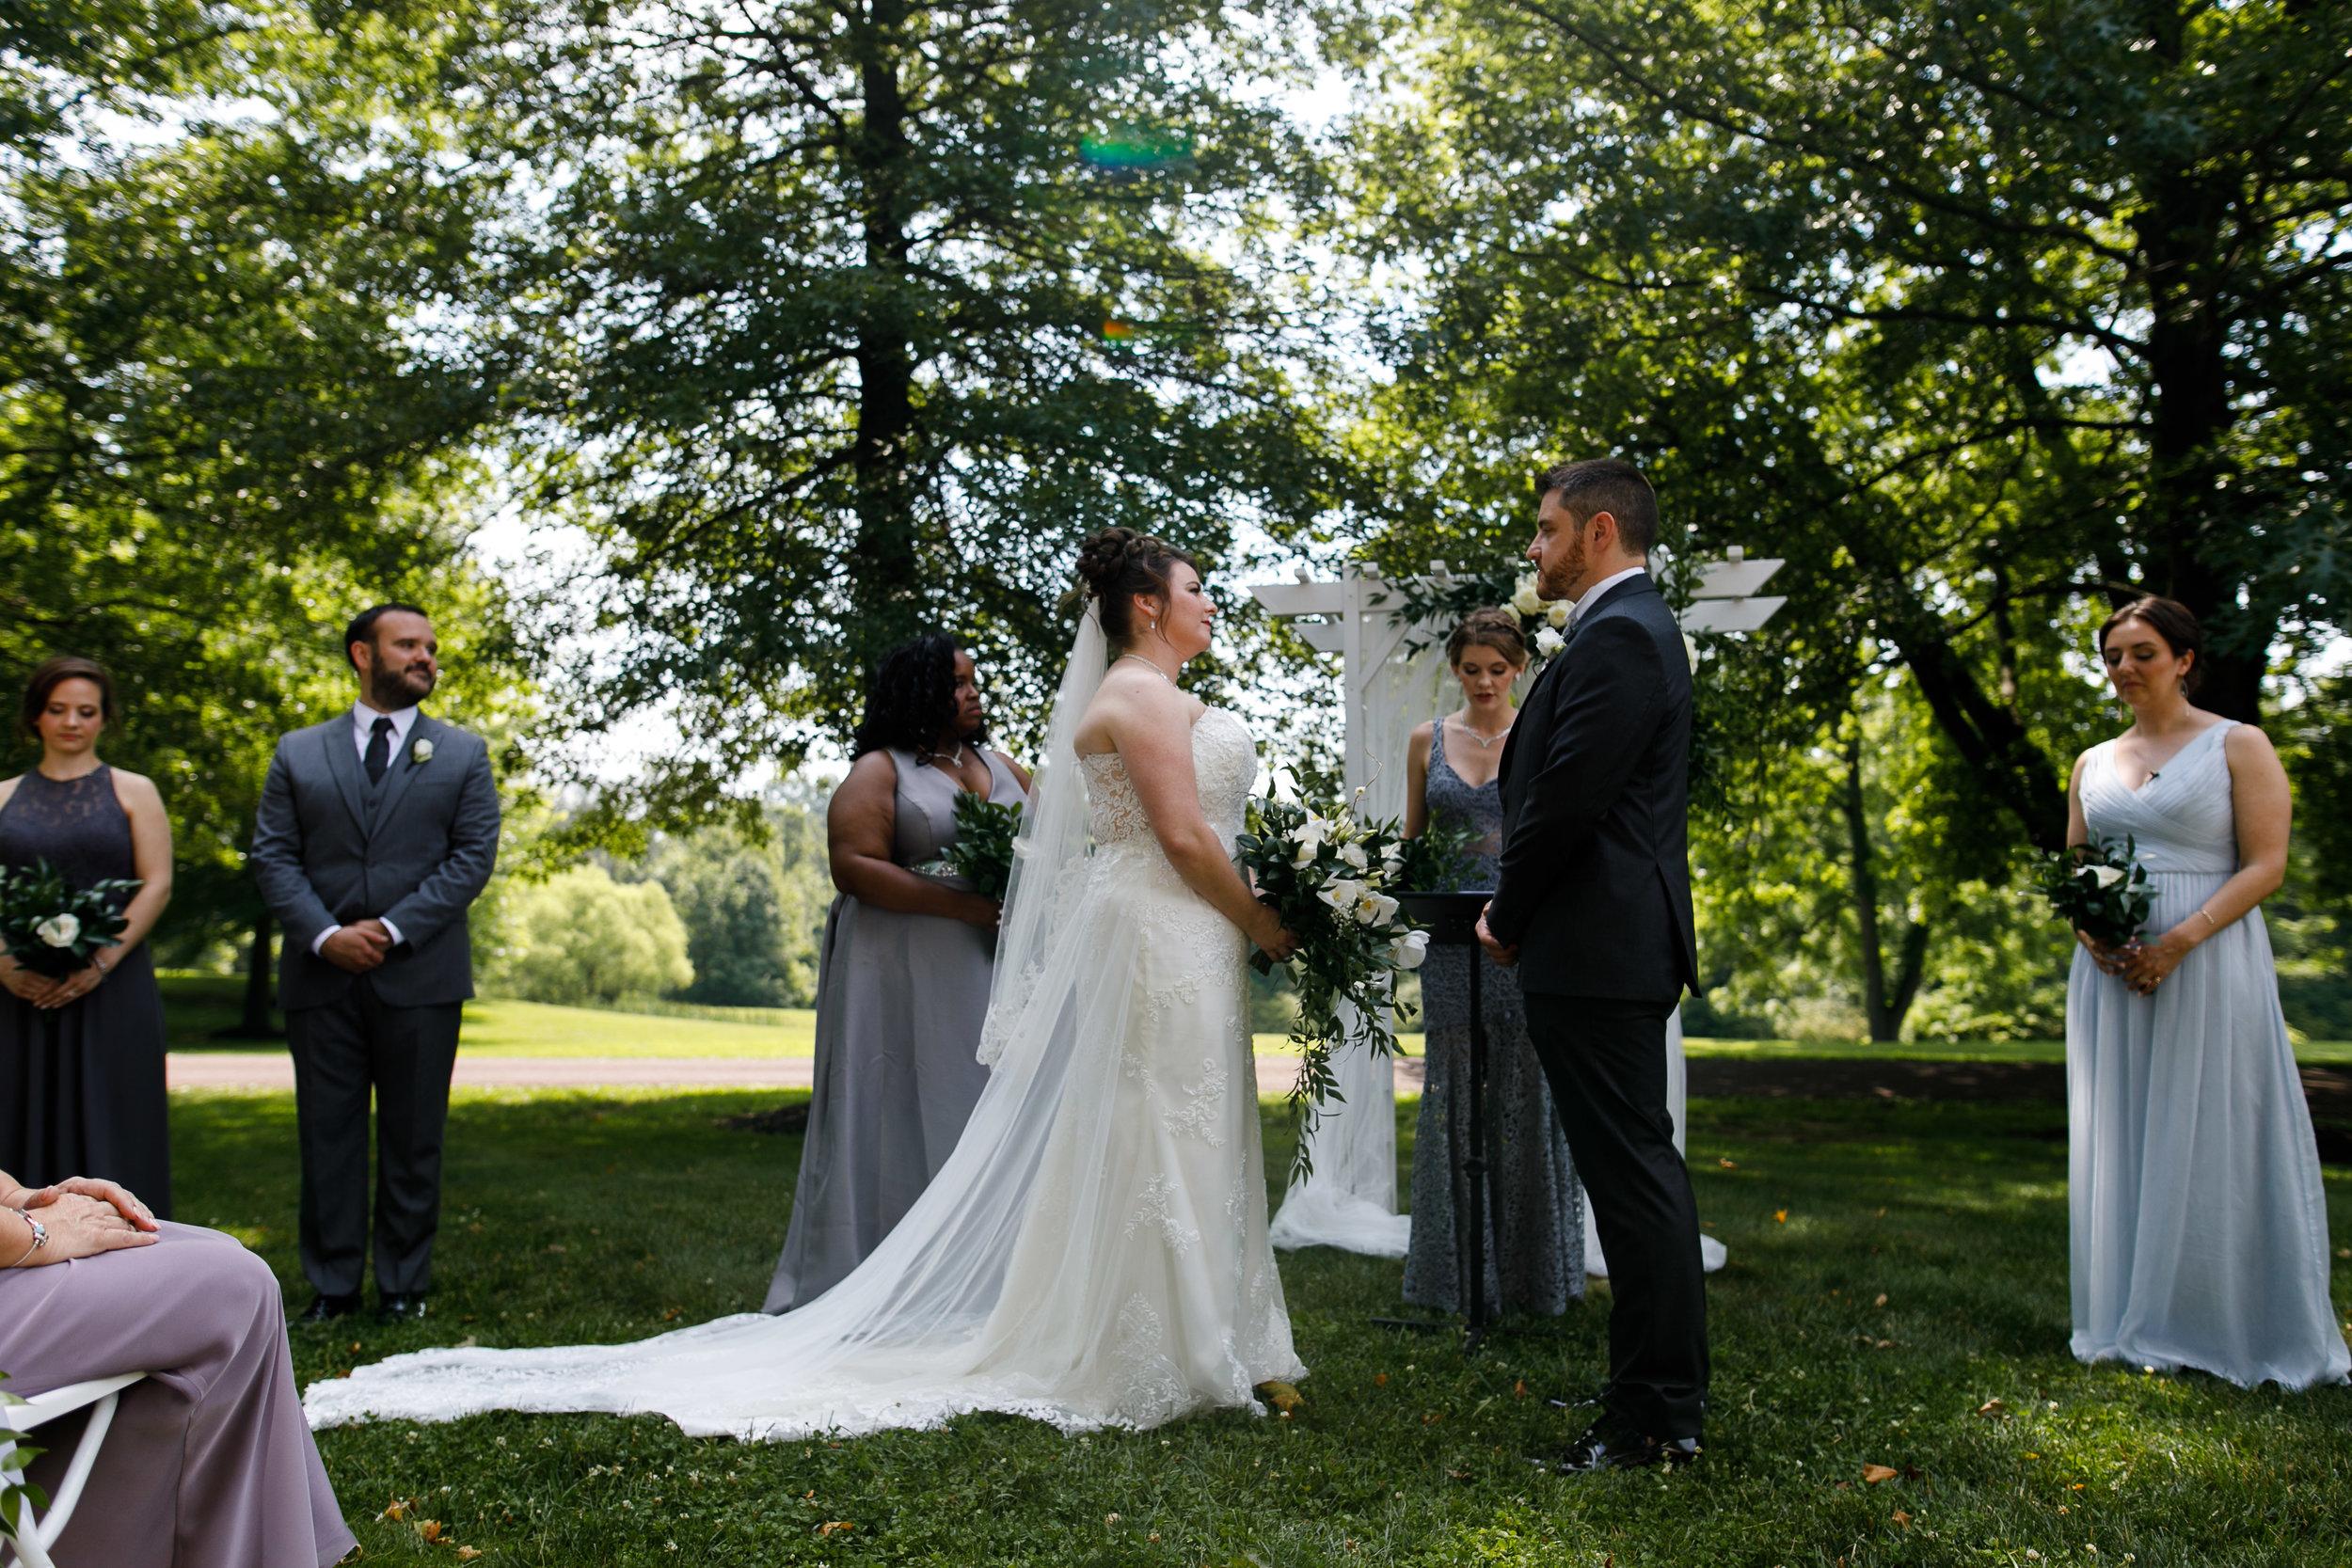 Wedding at Joseph Ambler In Bucks County PA30.jpg